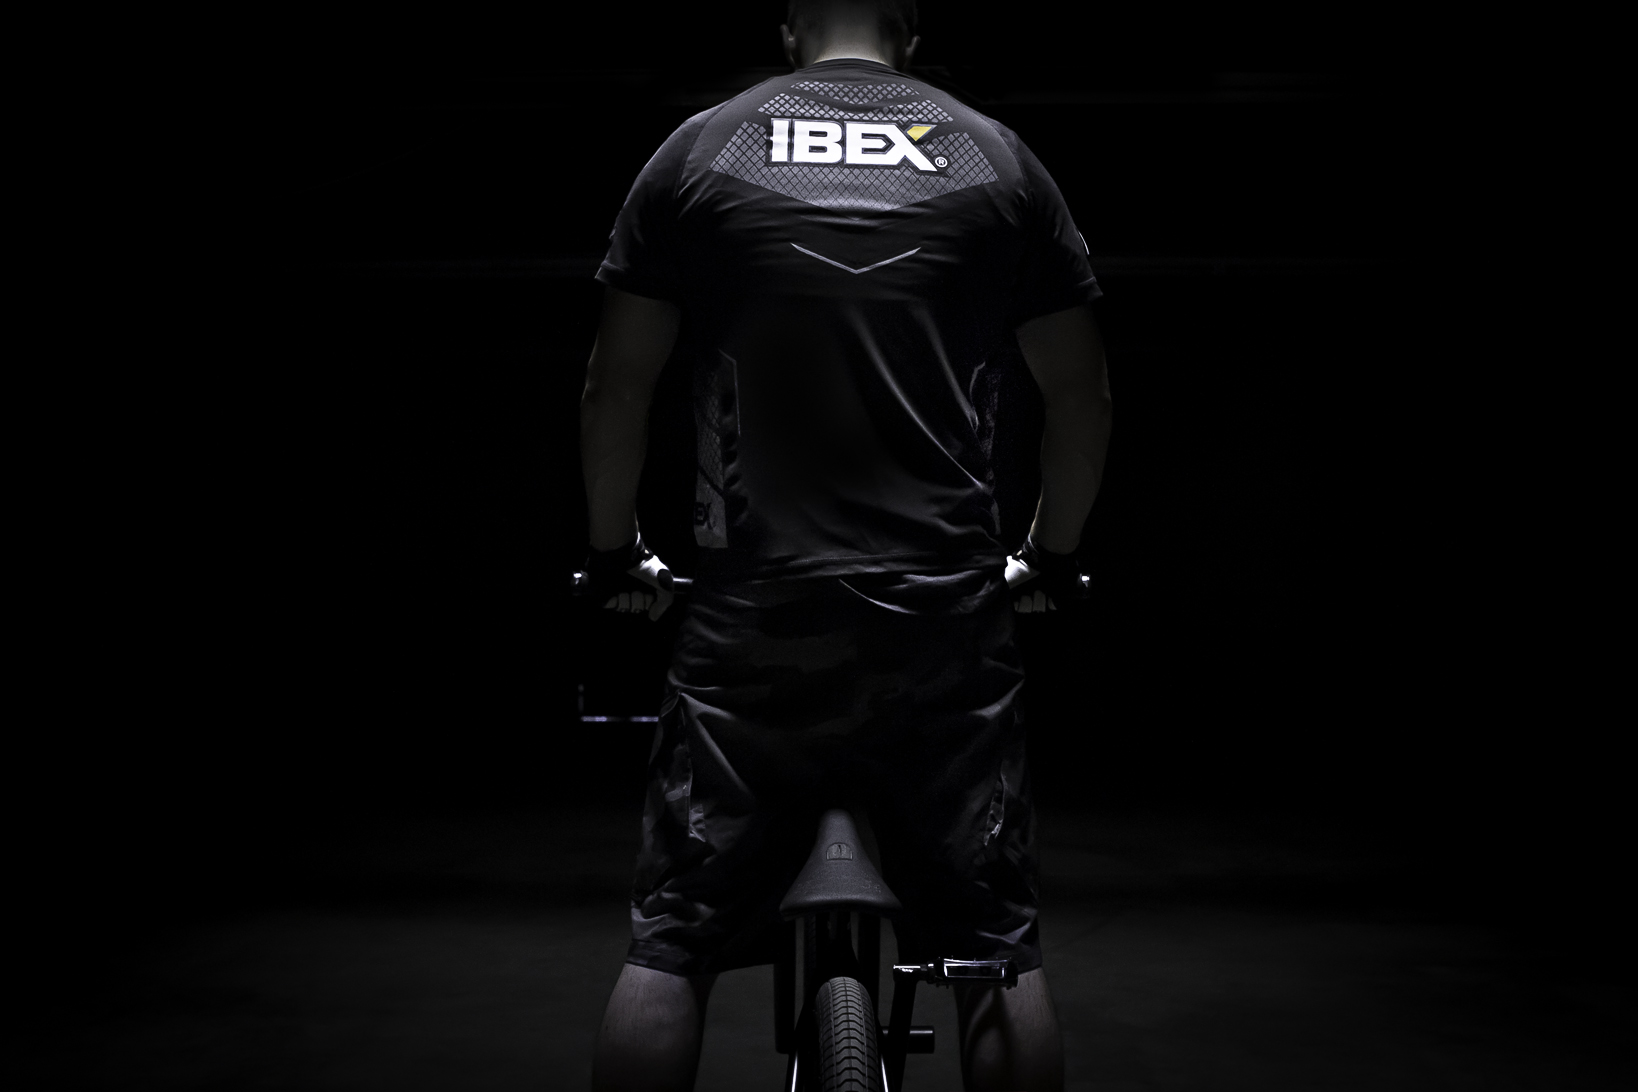 Ibex - jersey, back